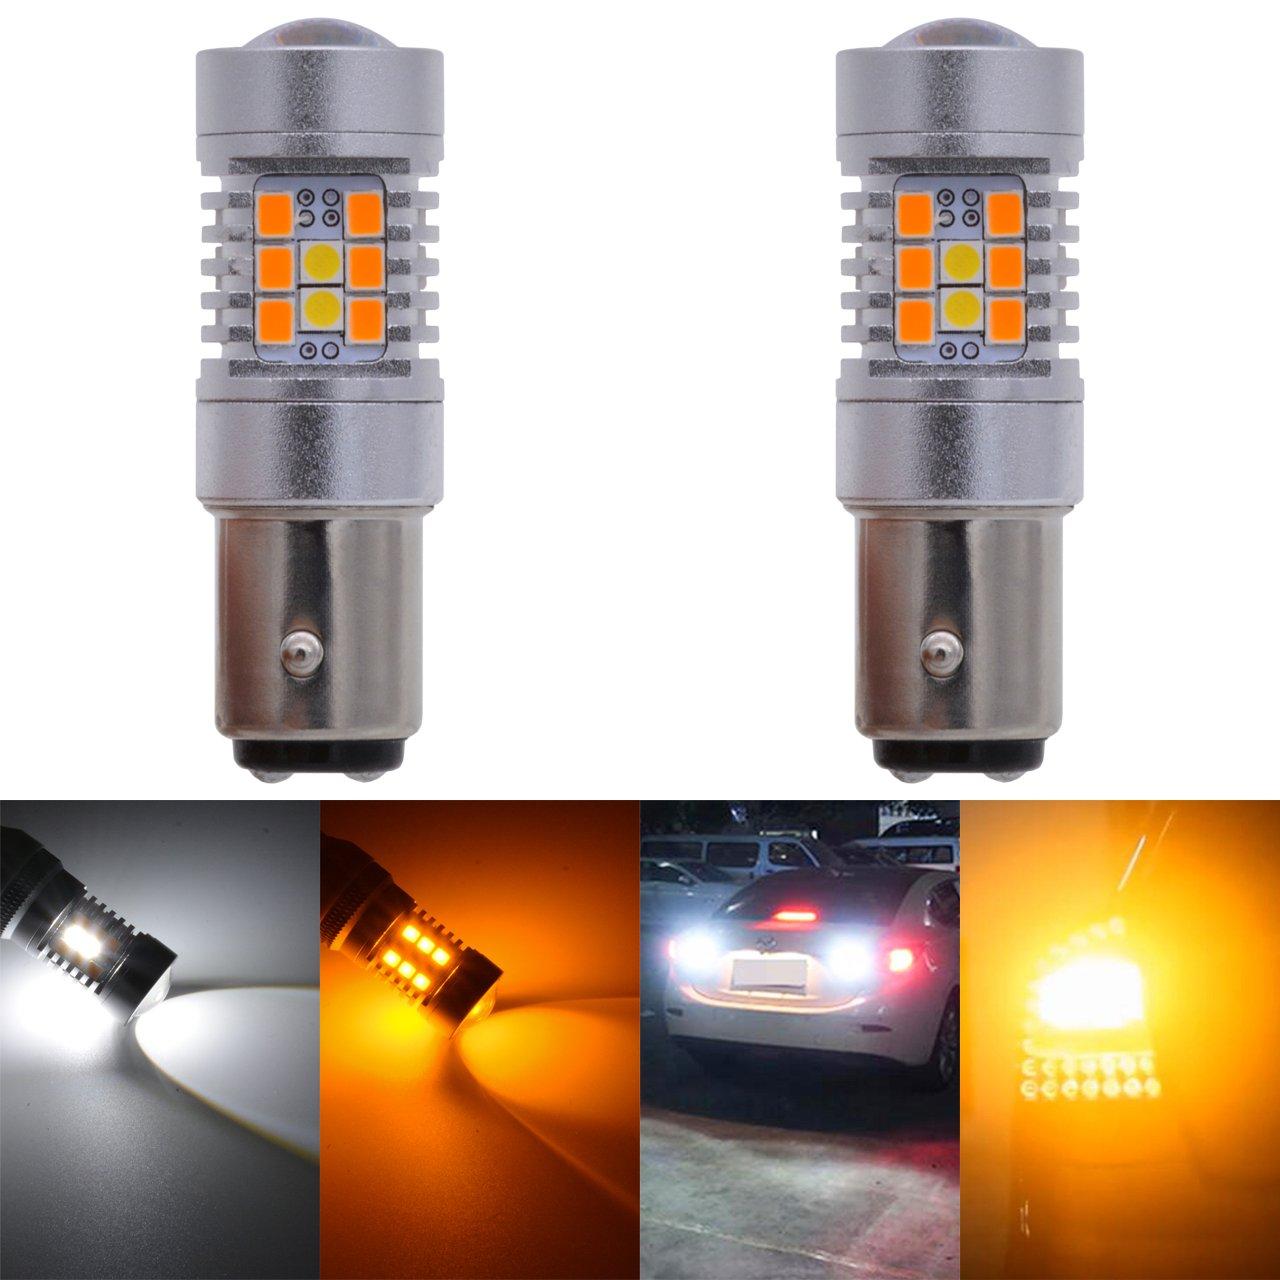 KaTur 7528 1157 BAY15D 1016 1034 Extremely Bright Amber/White Dual Color Switchback Turn Signal LED Light Bulbs 2835 21SMD Lens Brake LED Light 10.5W DC 12V 6500K (Pack of 2)